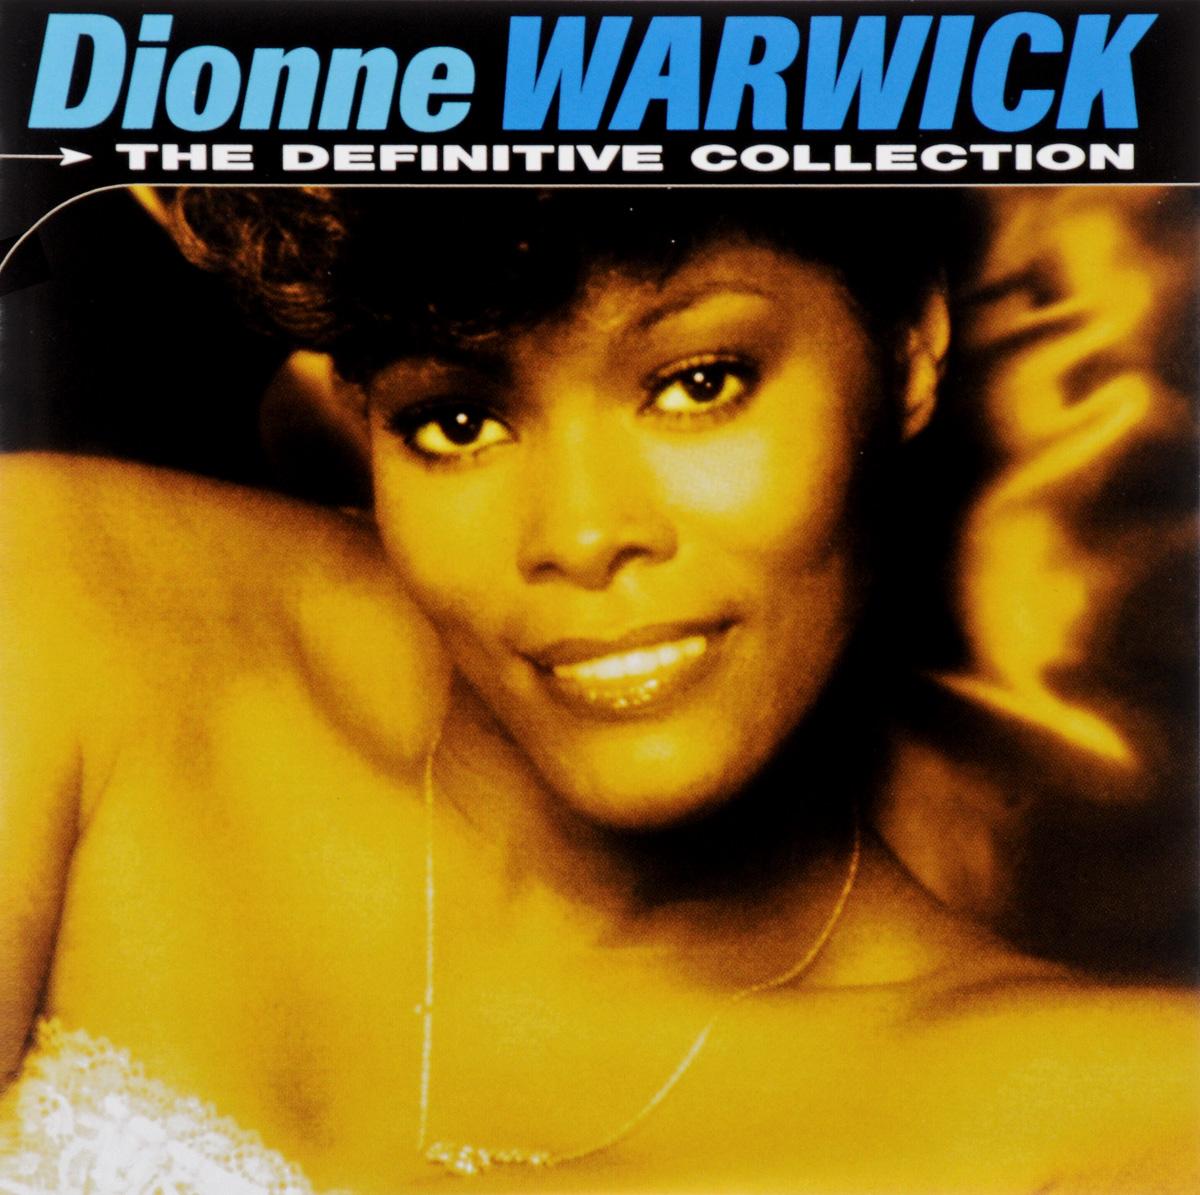 Дайонн Уорвик Dionne Warwick. The Definitive Collection powers the definitive hardcover collection vol 7